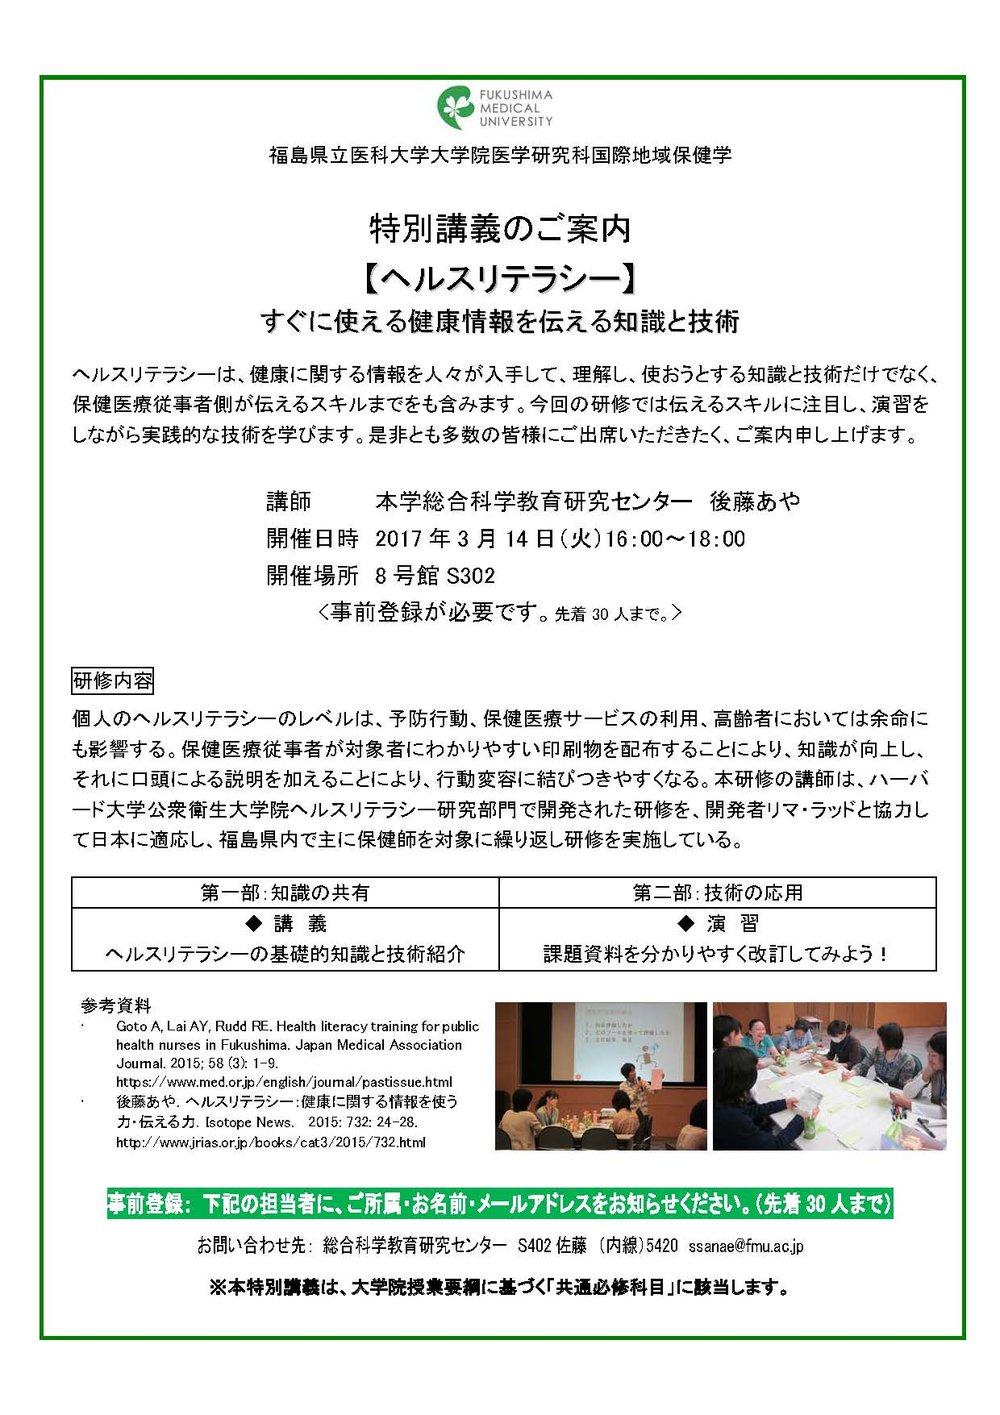 5 学内 poster_20170225.jpg